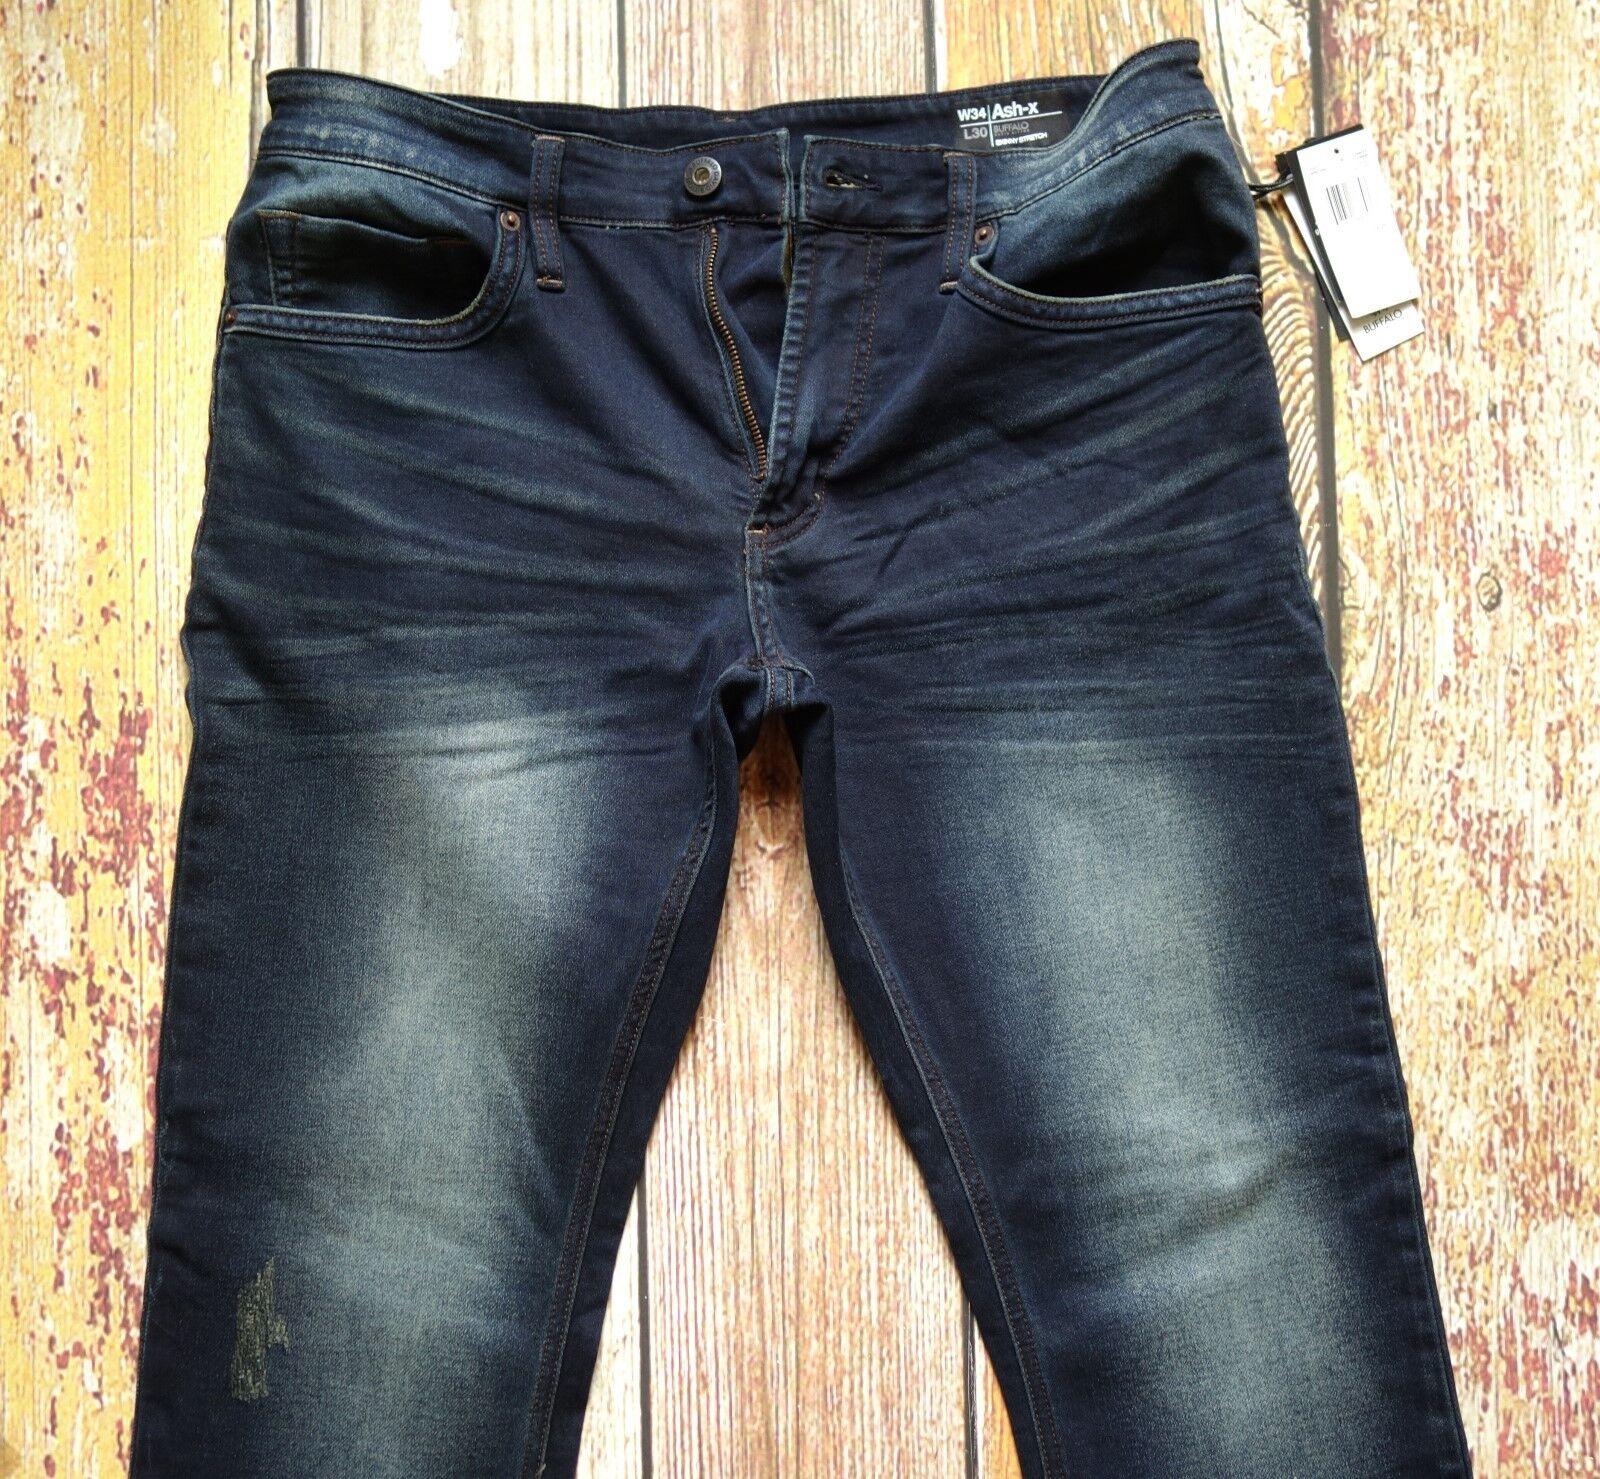 NEW Buffalo Ash-X W34xL30 Skinny Stretch Cotton Blend